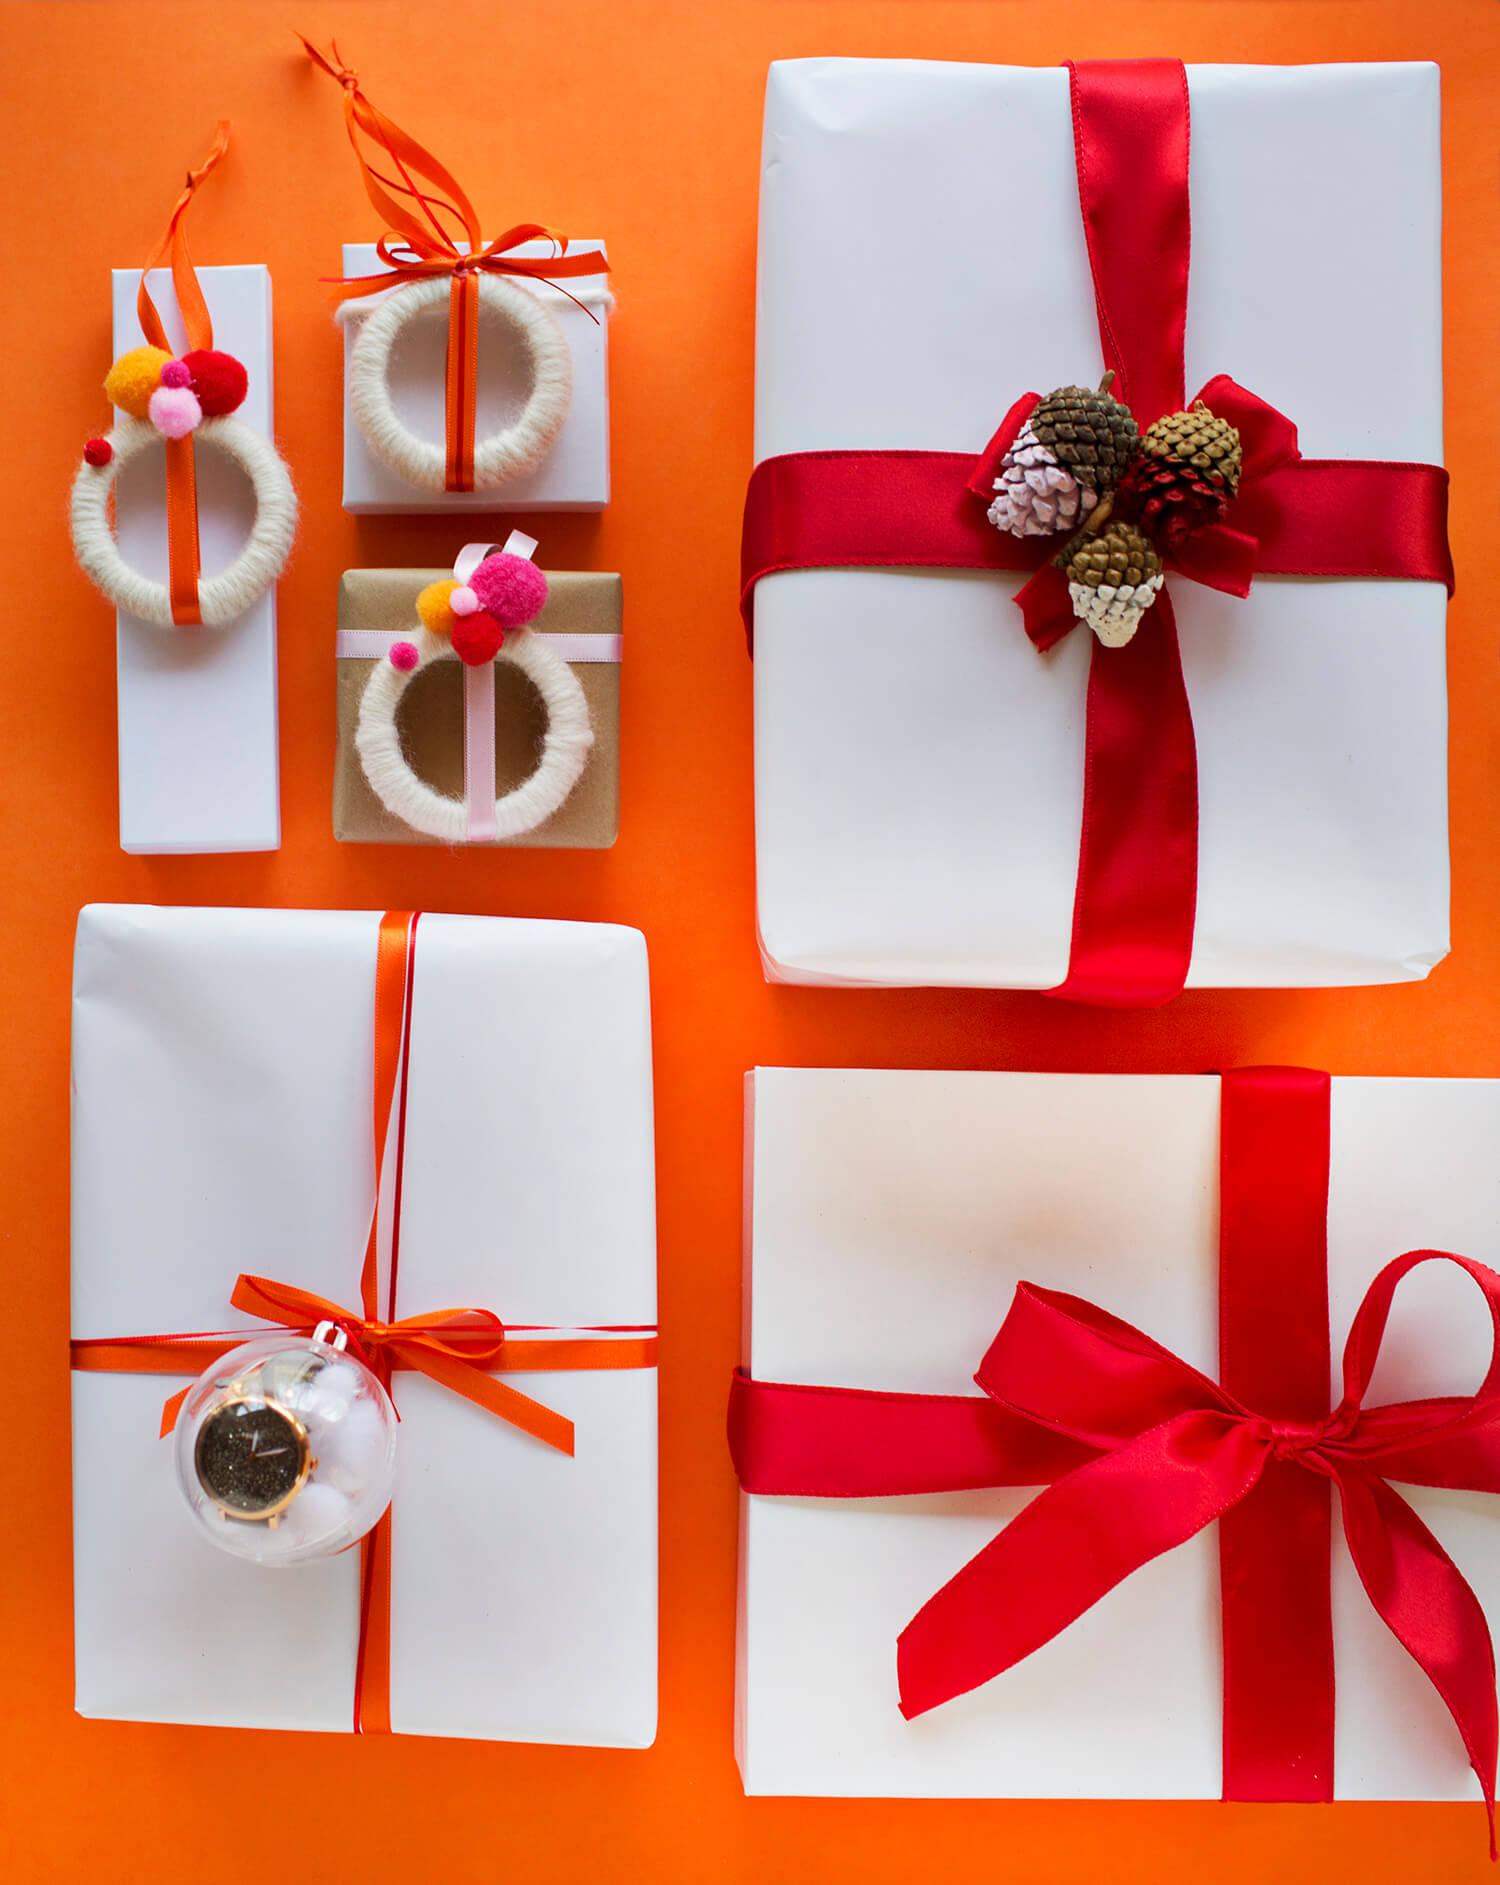 3 Ways to Personalize Gifts (via abeautifulmess.com)